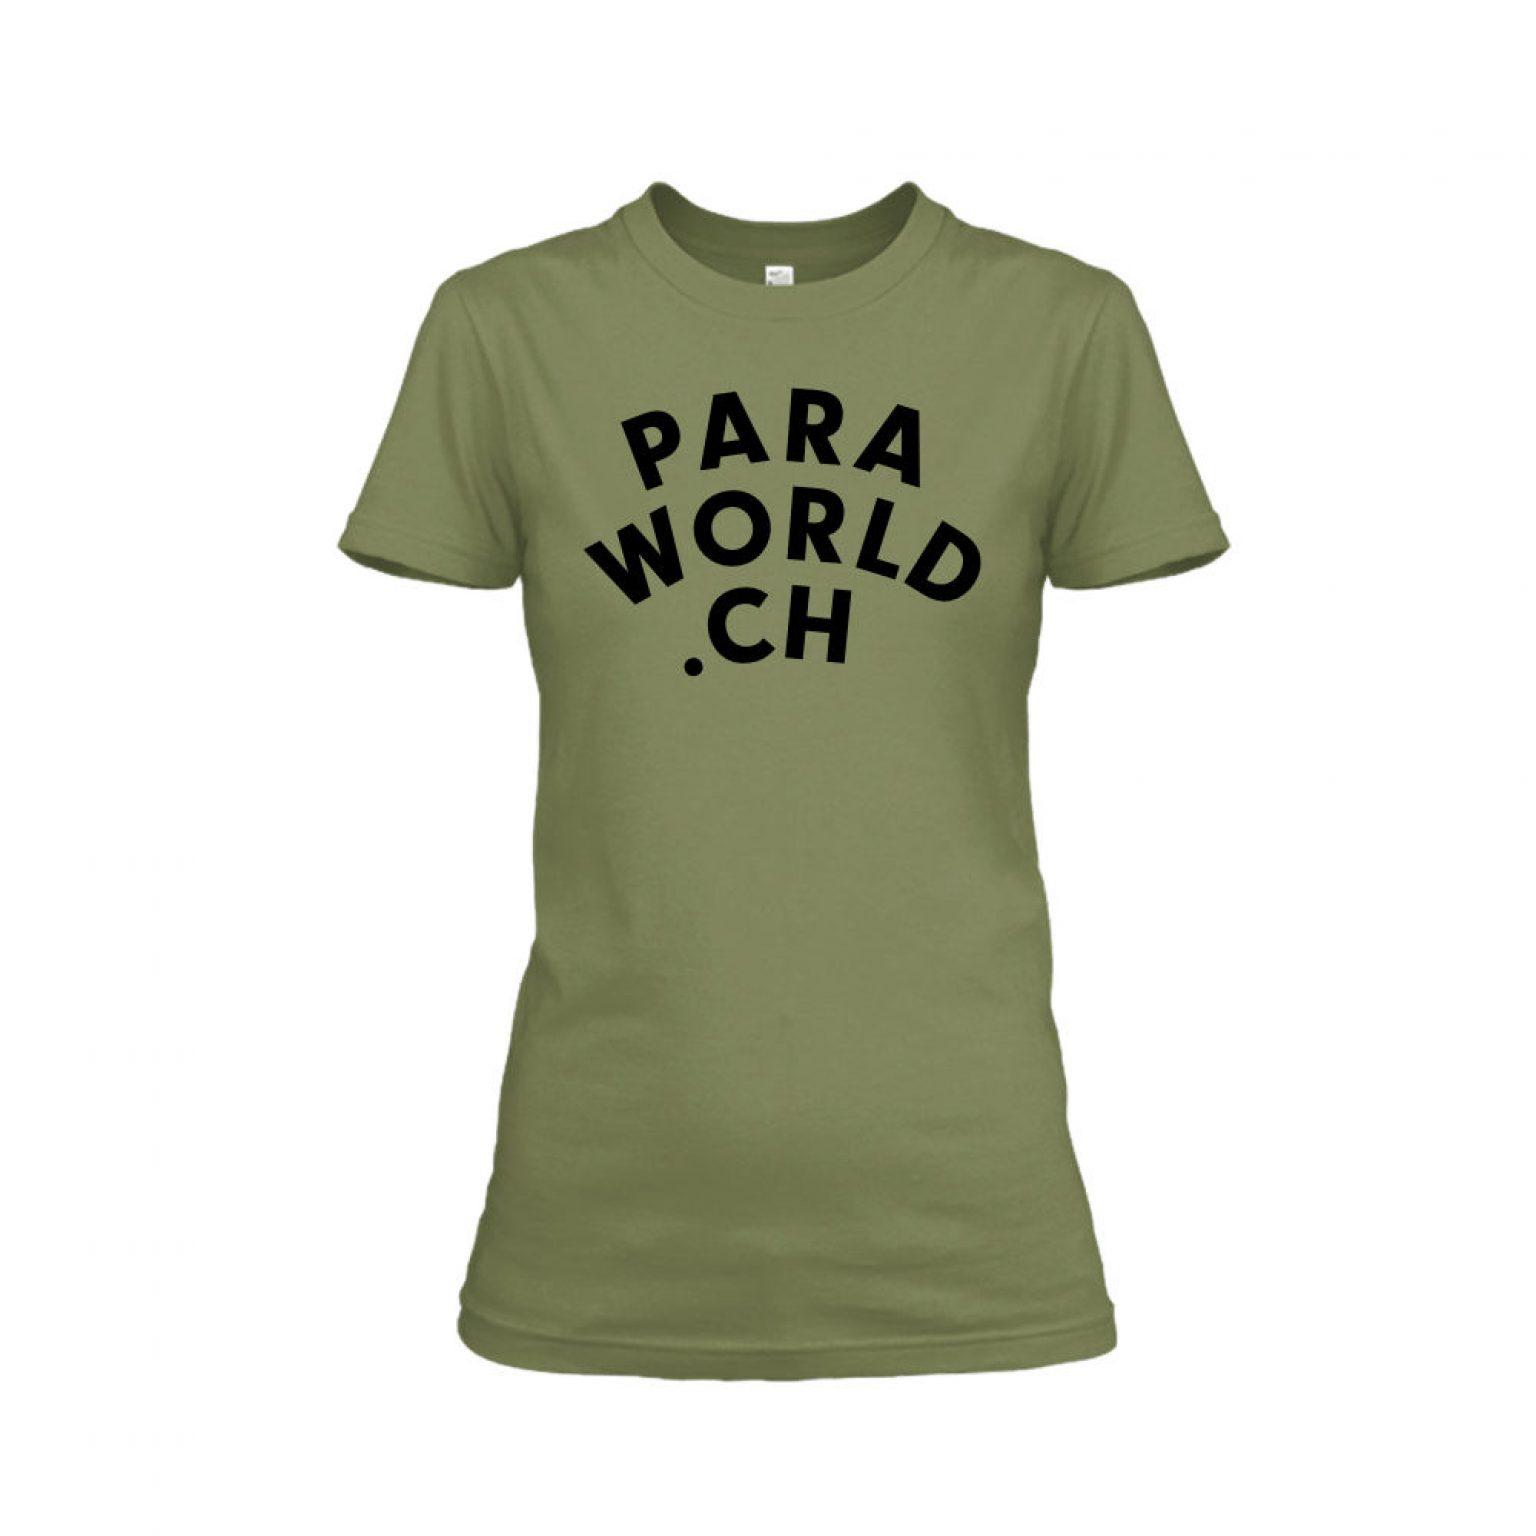 PW ClassicBlack shirt damen military